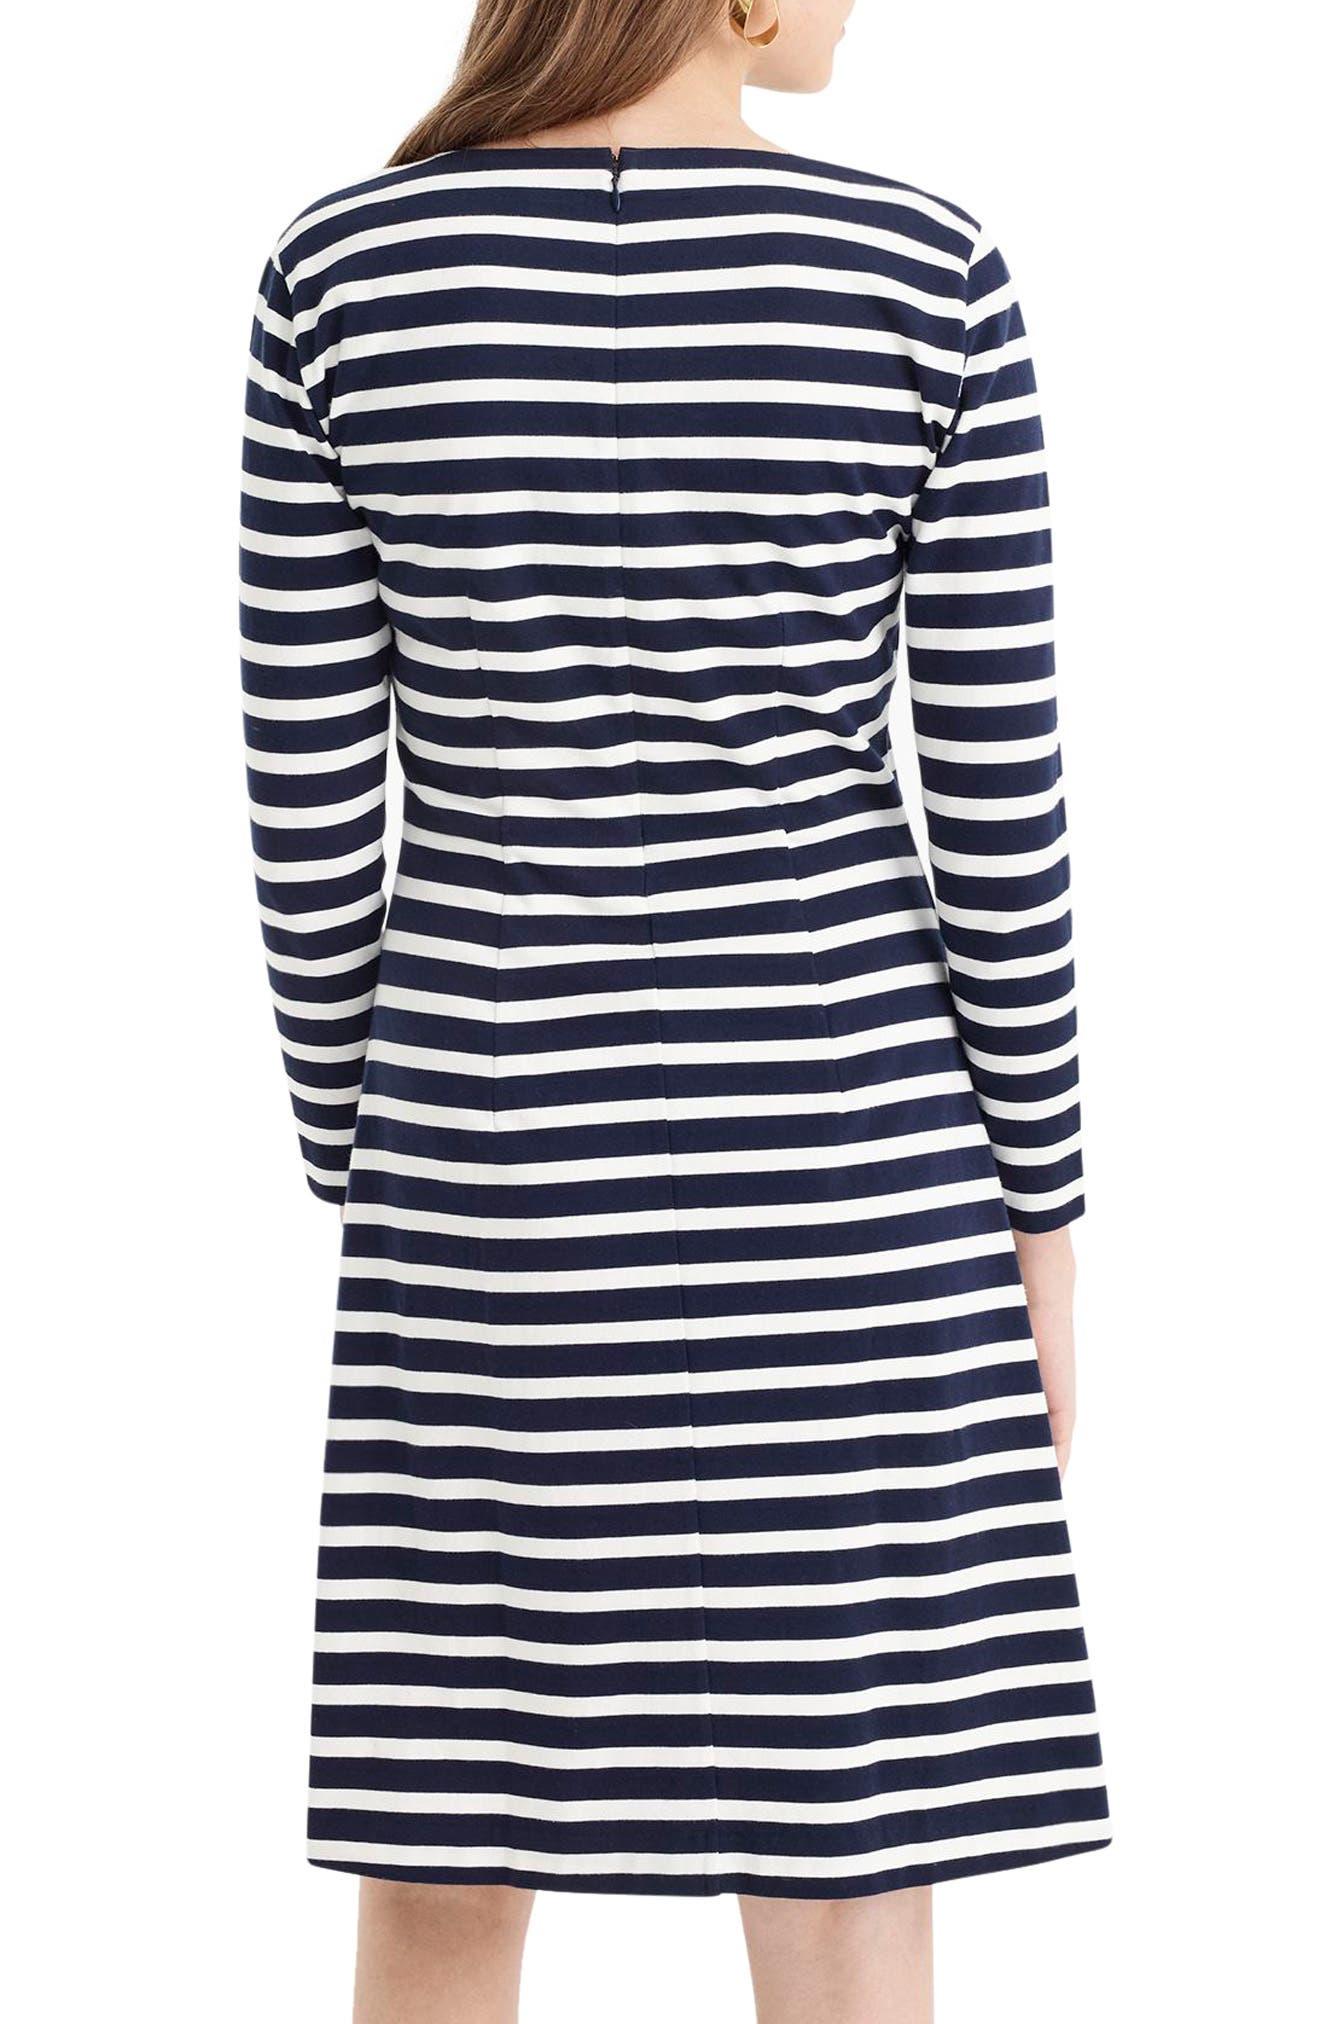 365 Stripe Knit Fit & Flare Dress,                             Alternate thumbnail 2, color,                             400